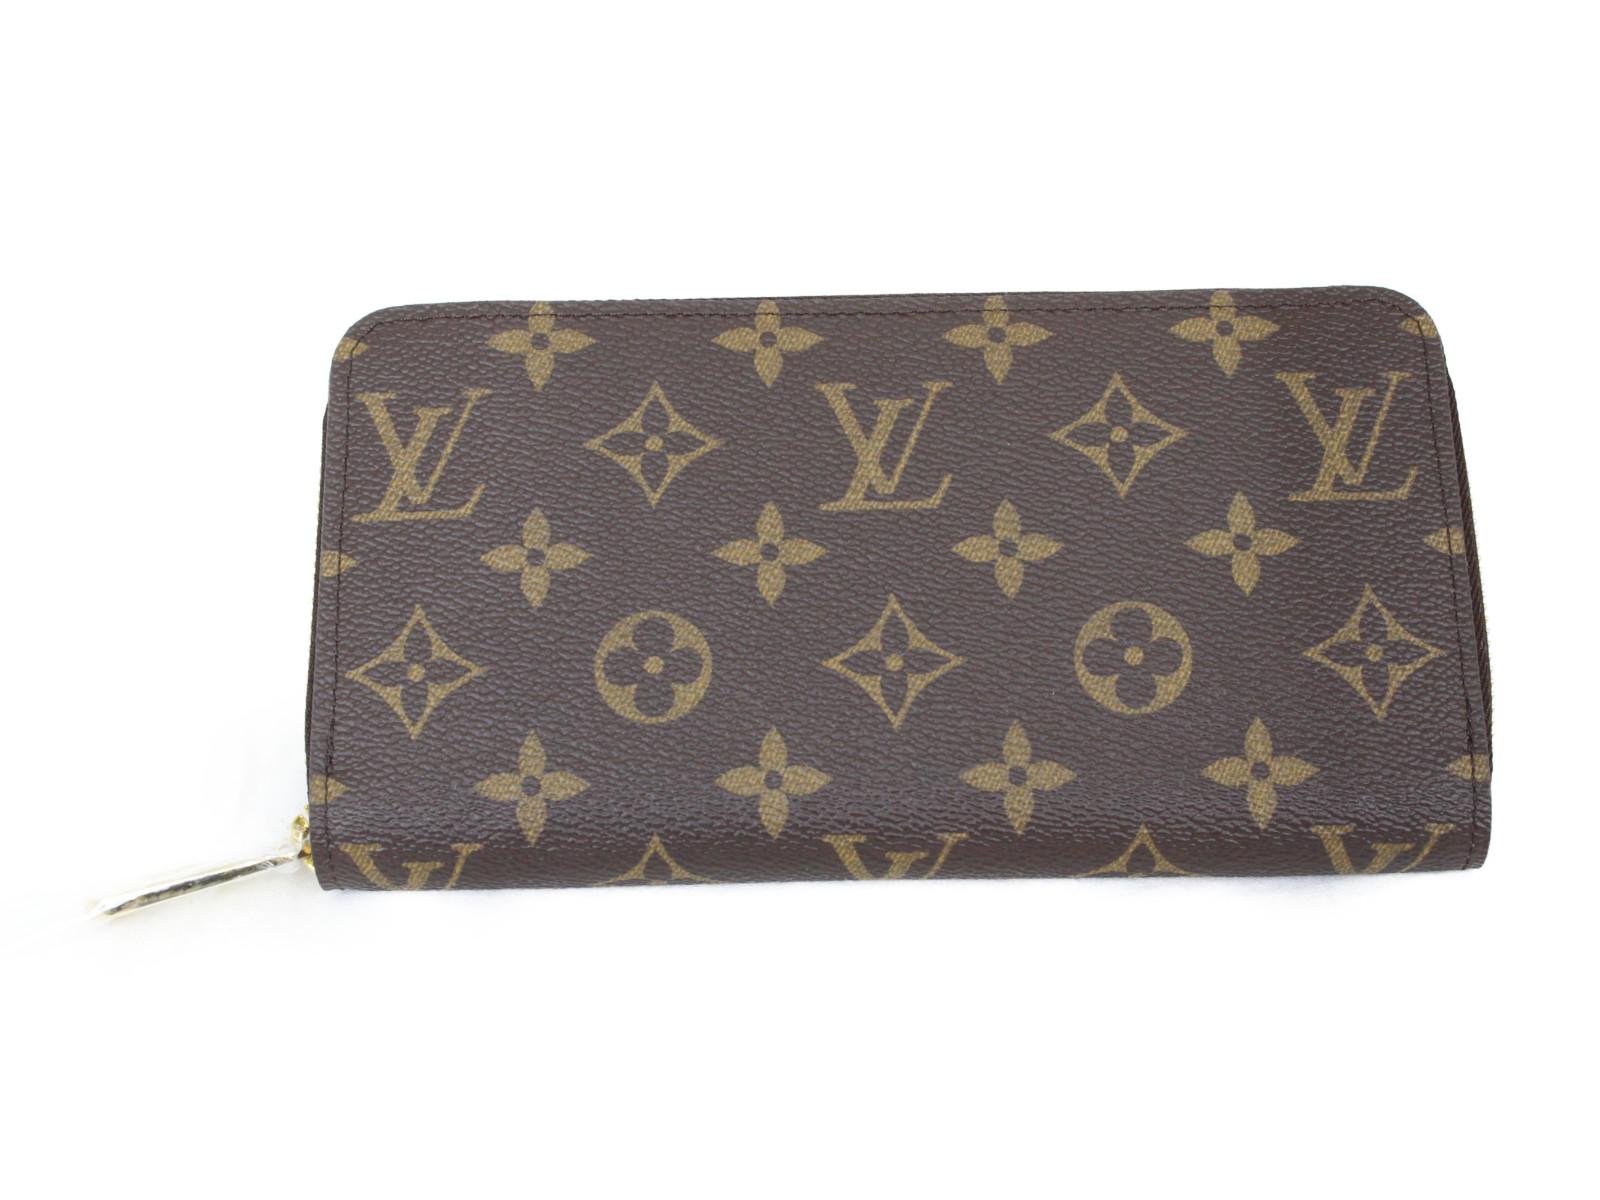 LOUIS VUITTON ルイヴィトン ジッピーウォレット M41895 長財布 フューシャ ピンク レディース プレゼント包装可【未使用】